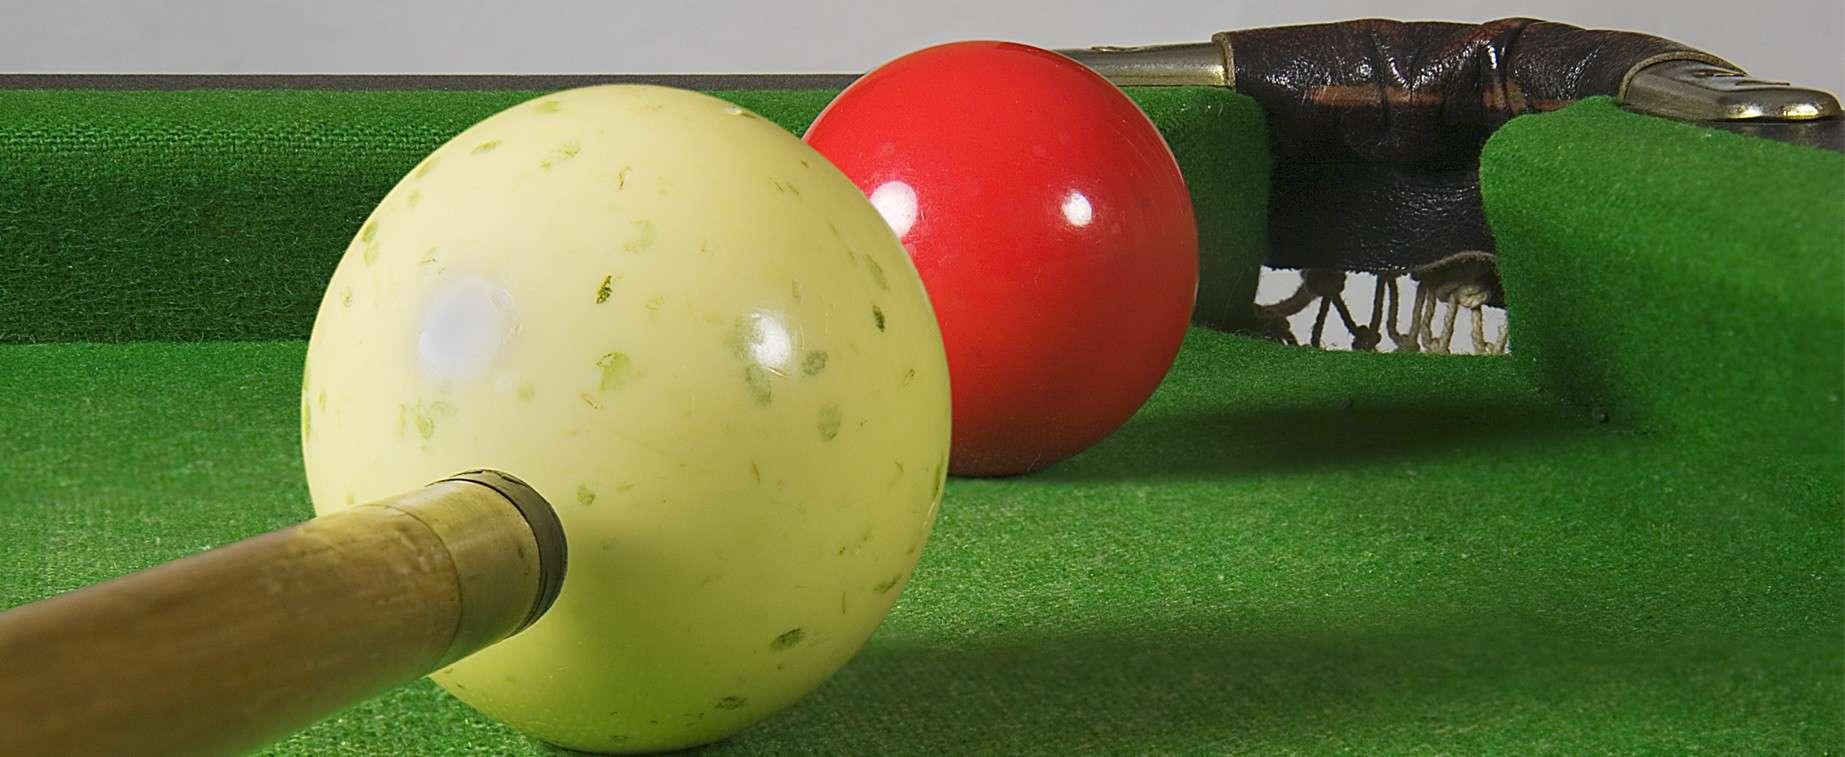 One Pocket Billiards